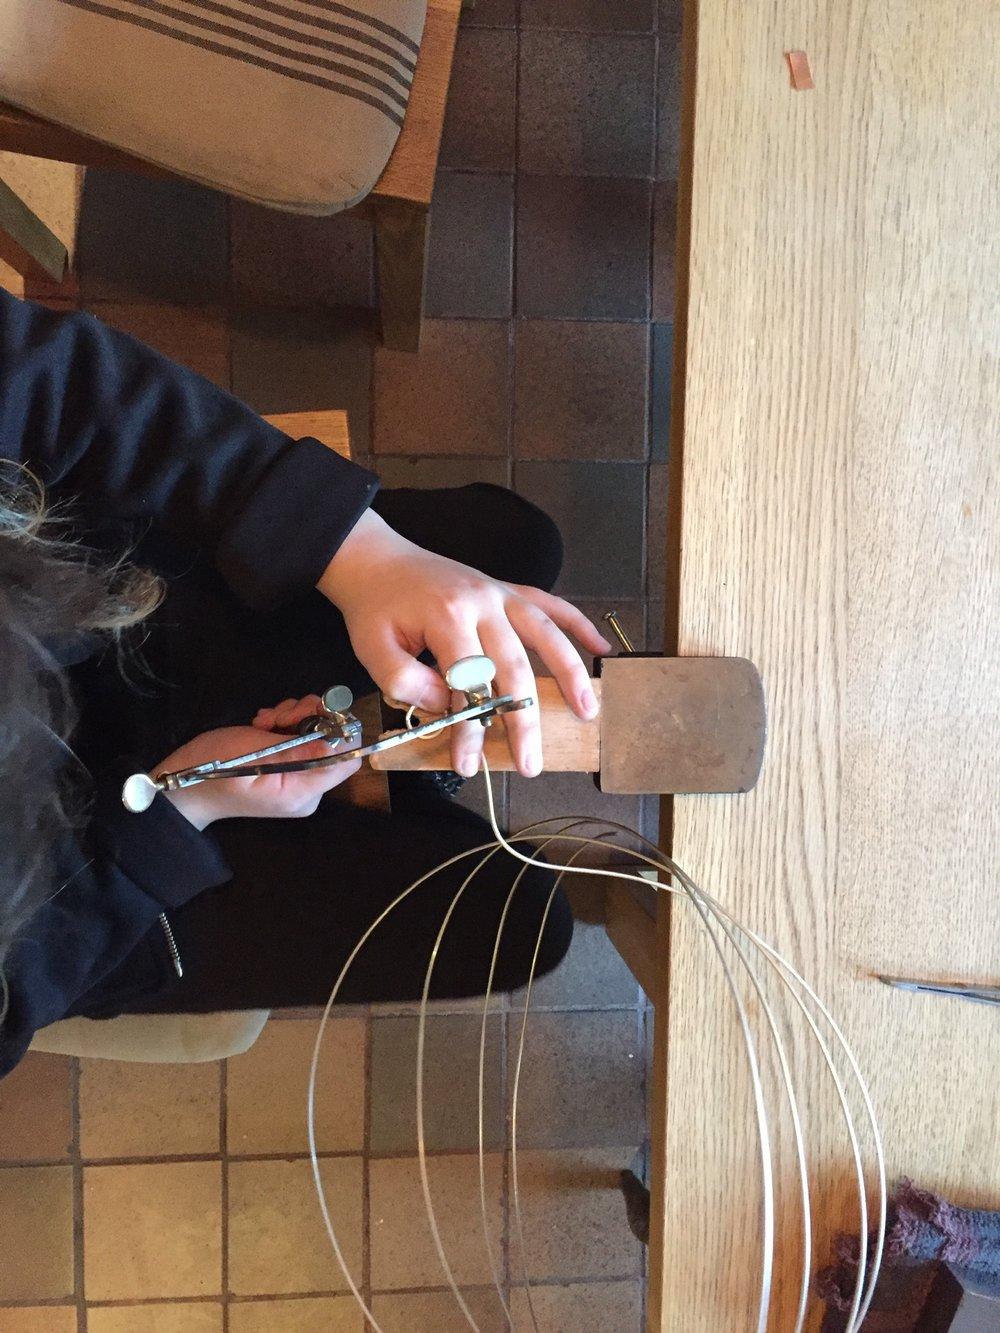 childrens-jewellery-making-workshop-4.jpeg